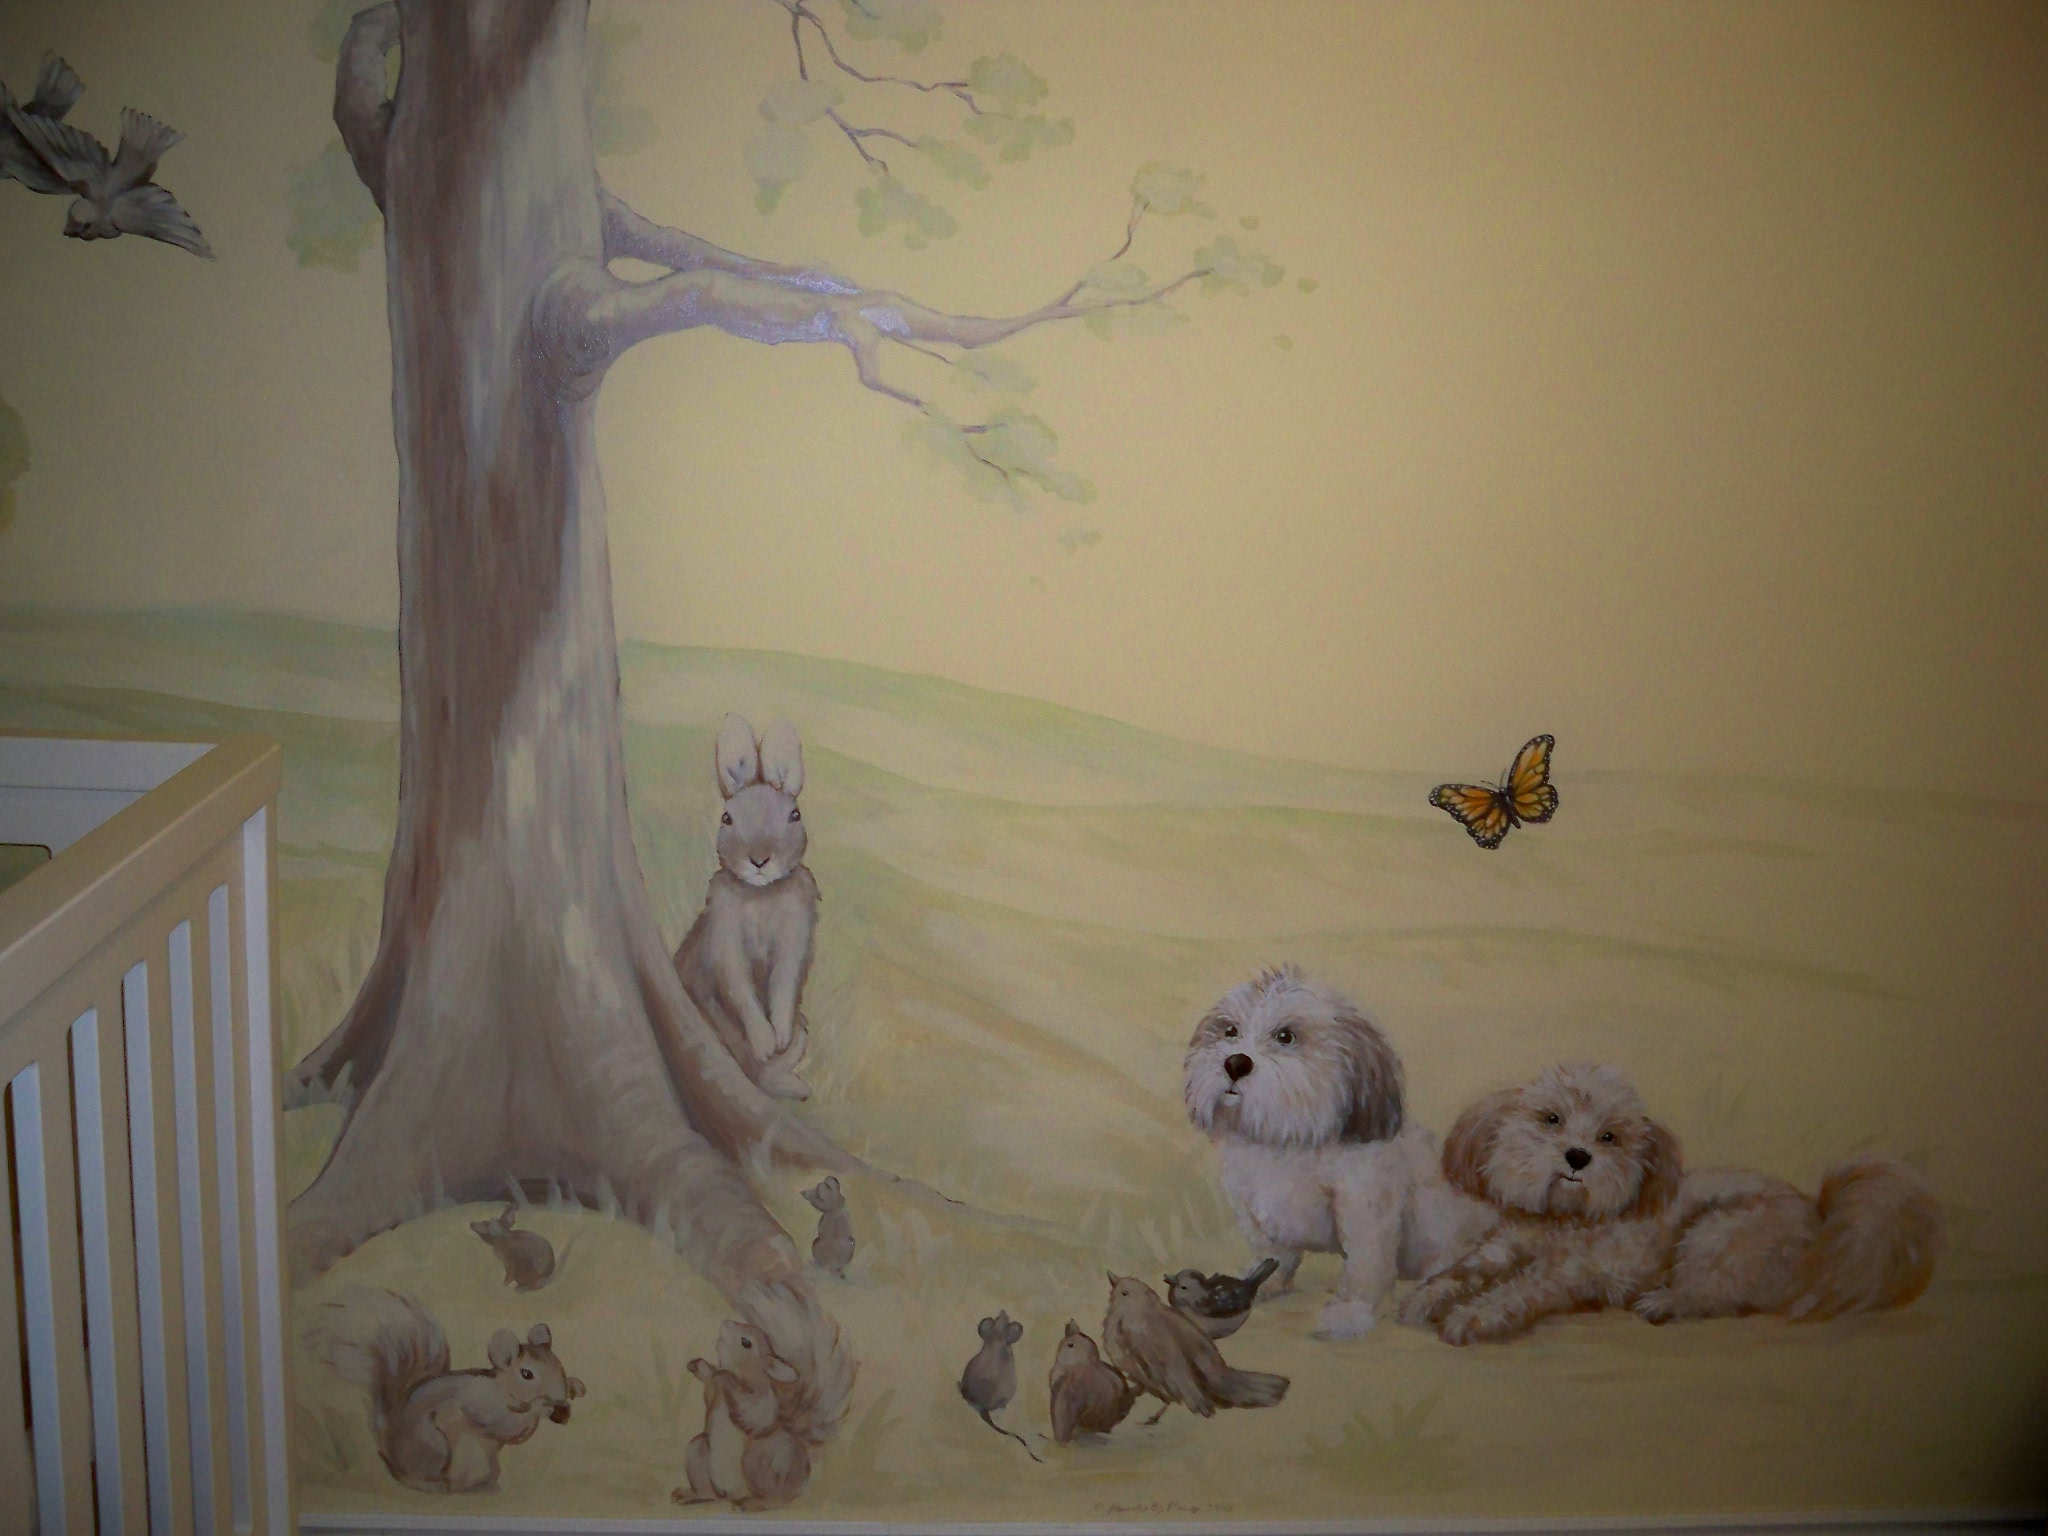 Murals By Marg Kayla's Nursery Mural 1